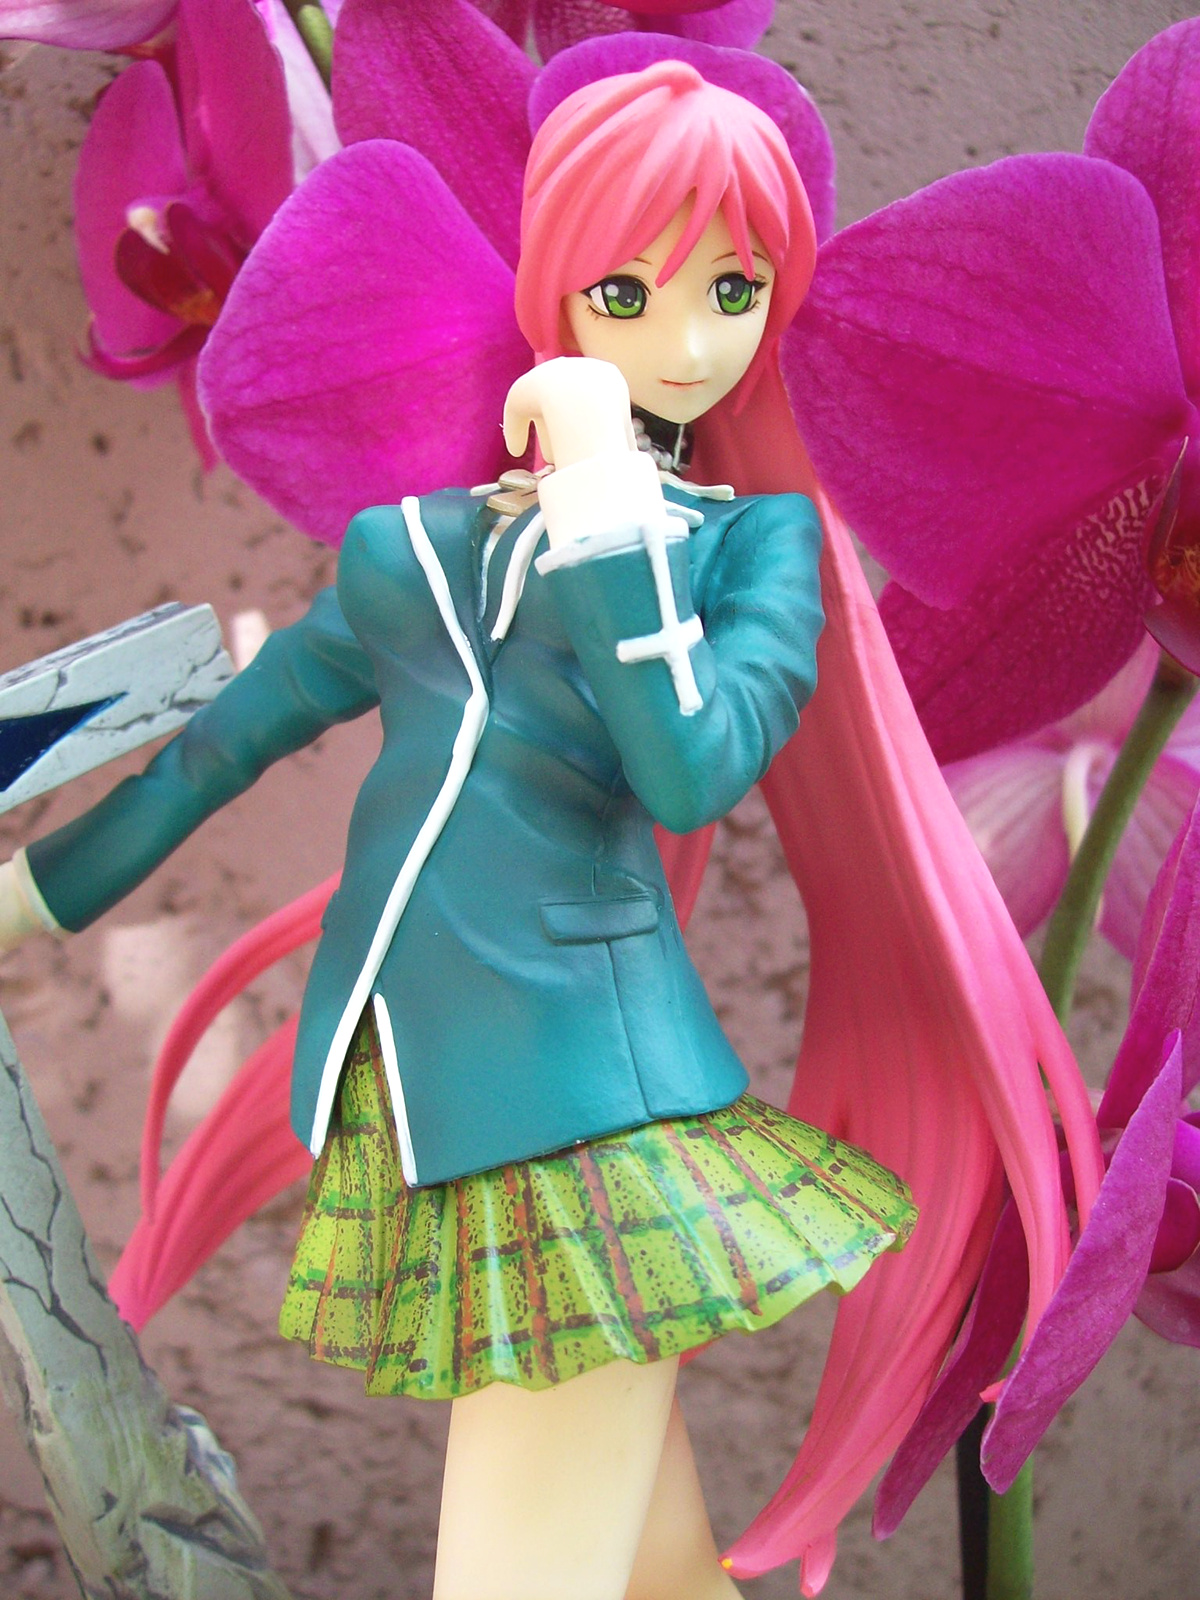 shueisha rosario_+_vampire akashiya_moka shueisha_solid_selection